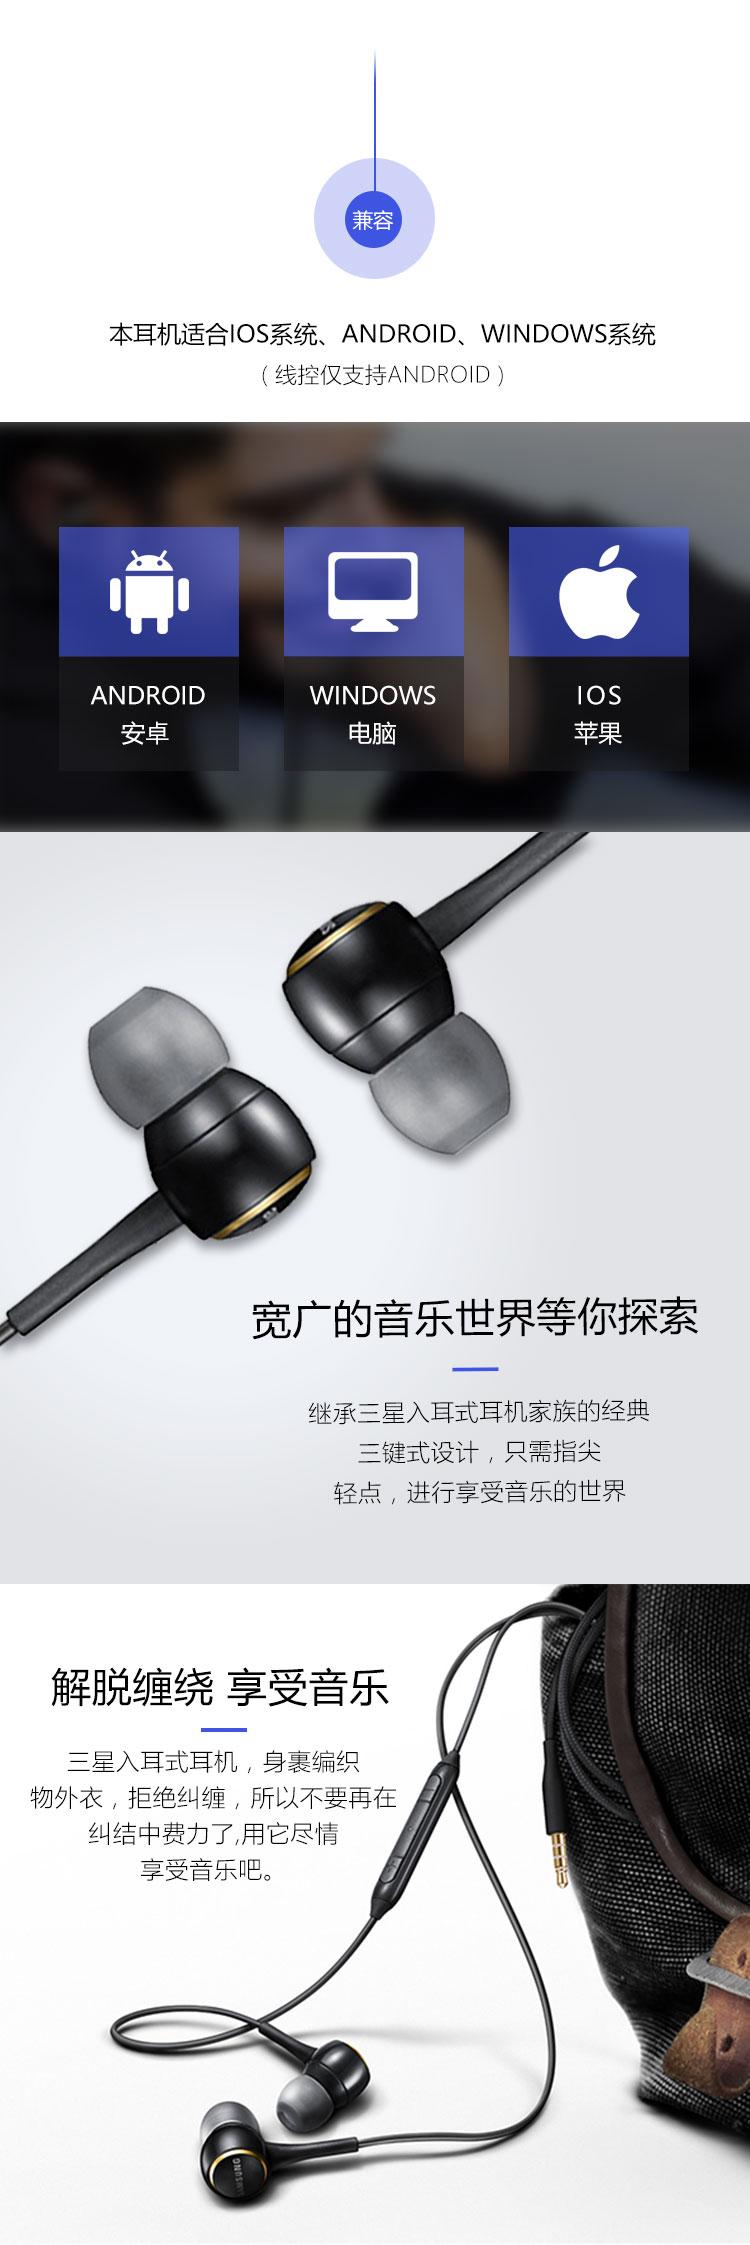 Samsung (SAMSUNG) Samsung headset in the ear type IG935 line headset / phone headset / music headset white (weaving, general Andrews) - Jingdong